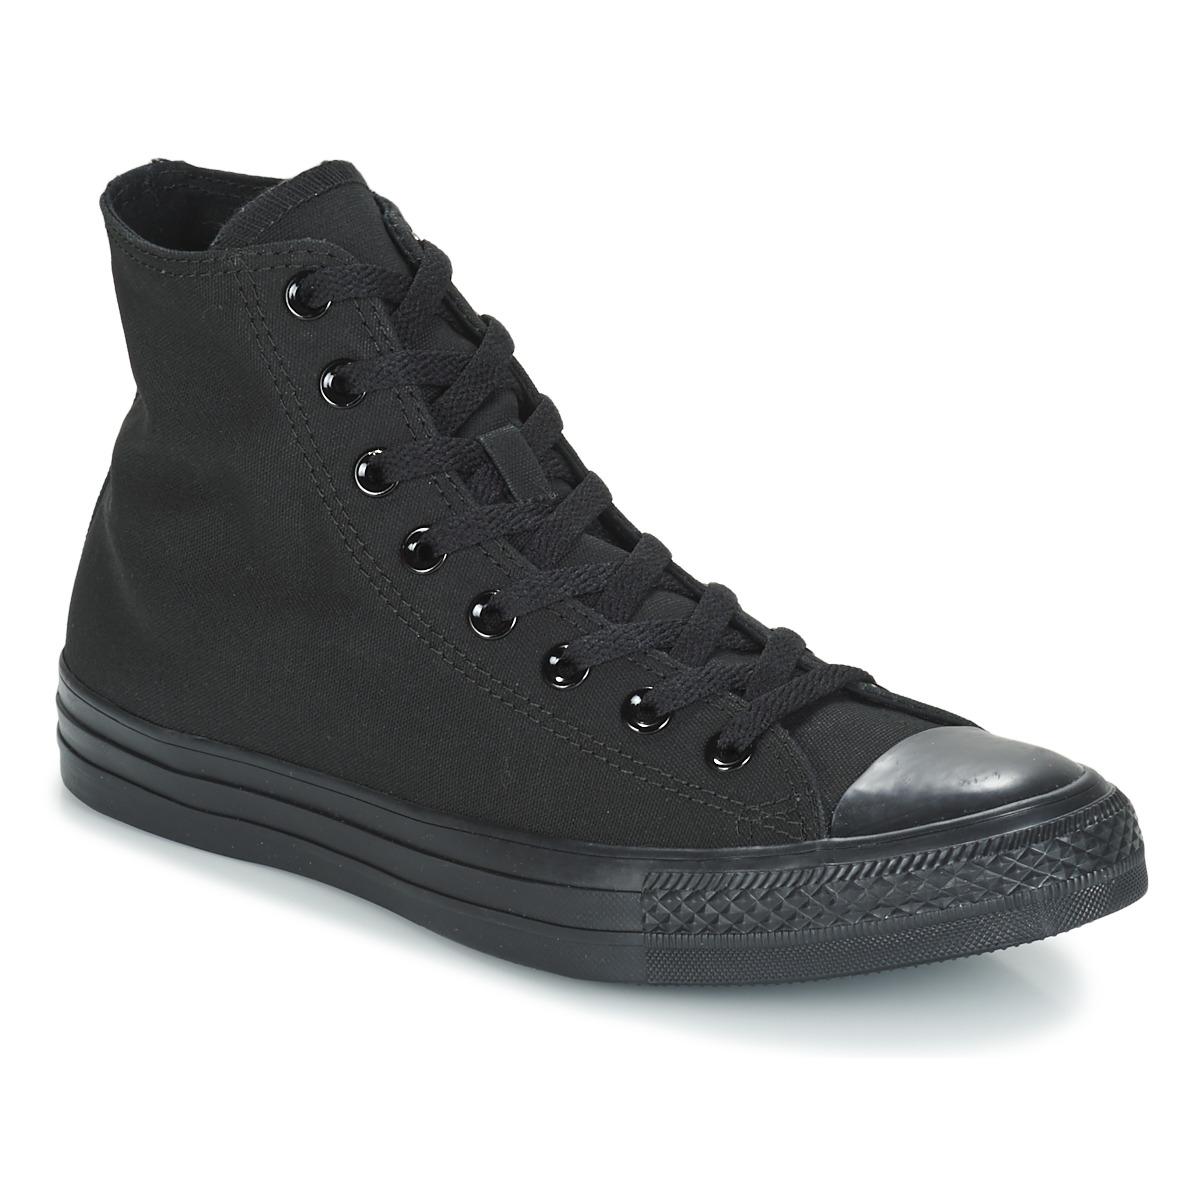 Converse CHUCK TAYLOR ALL STAR MONO HI Black